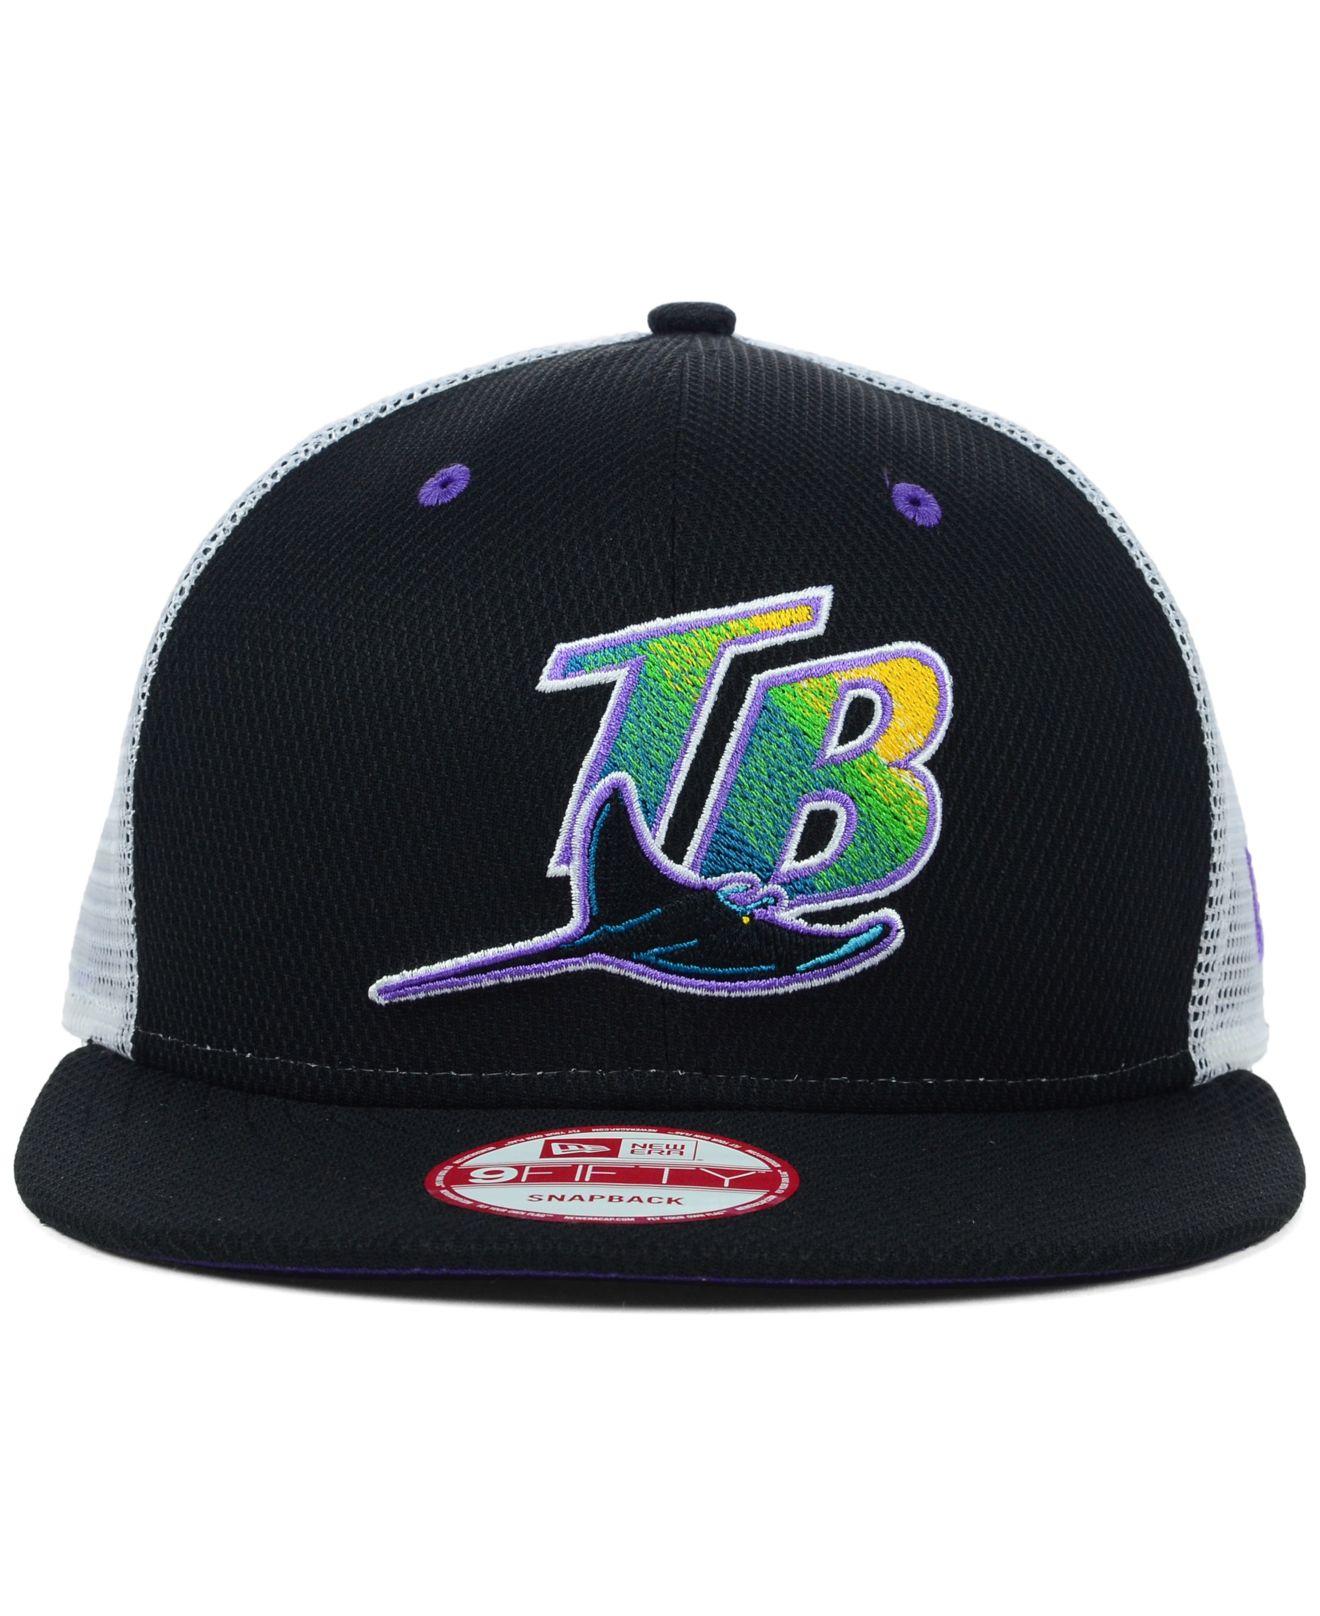 pretty nice 888b5 9e11d Lyst - KTZ Tampa Bay Rays Mlb Diamond Mesh 9Fifty Snapback Cap in ...